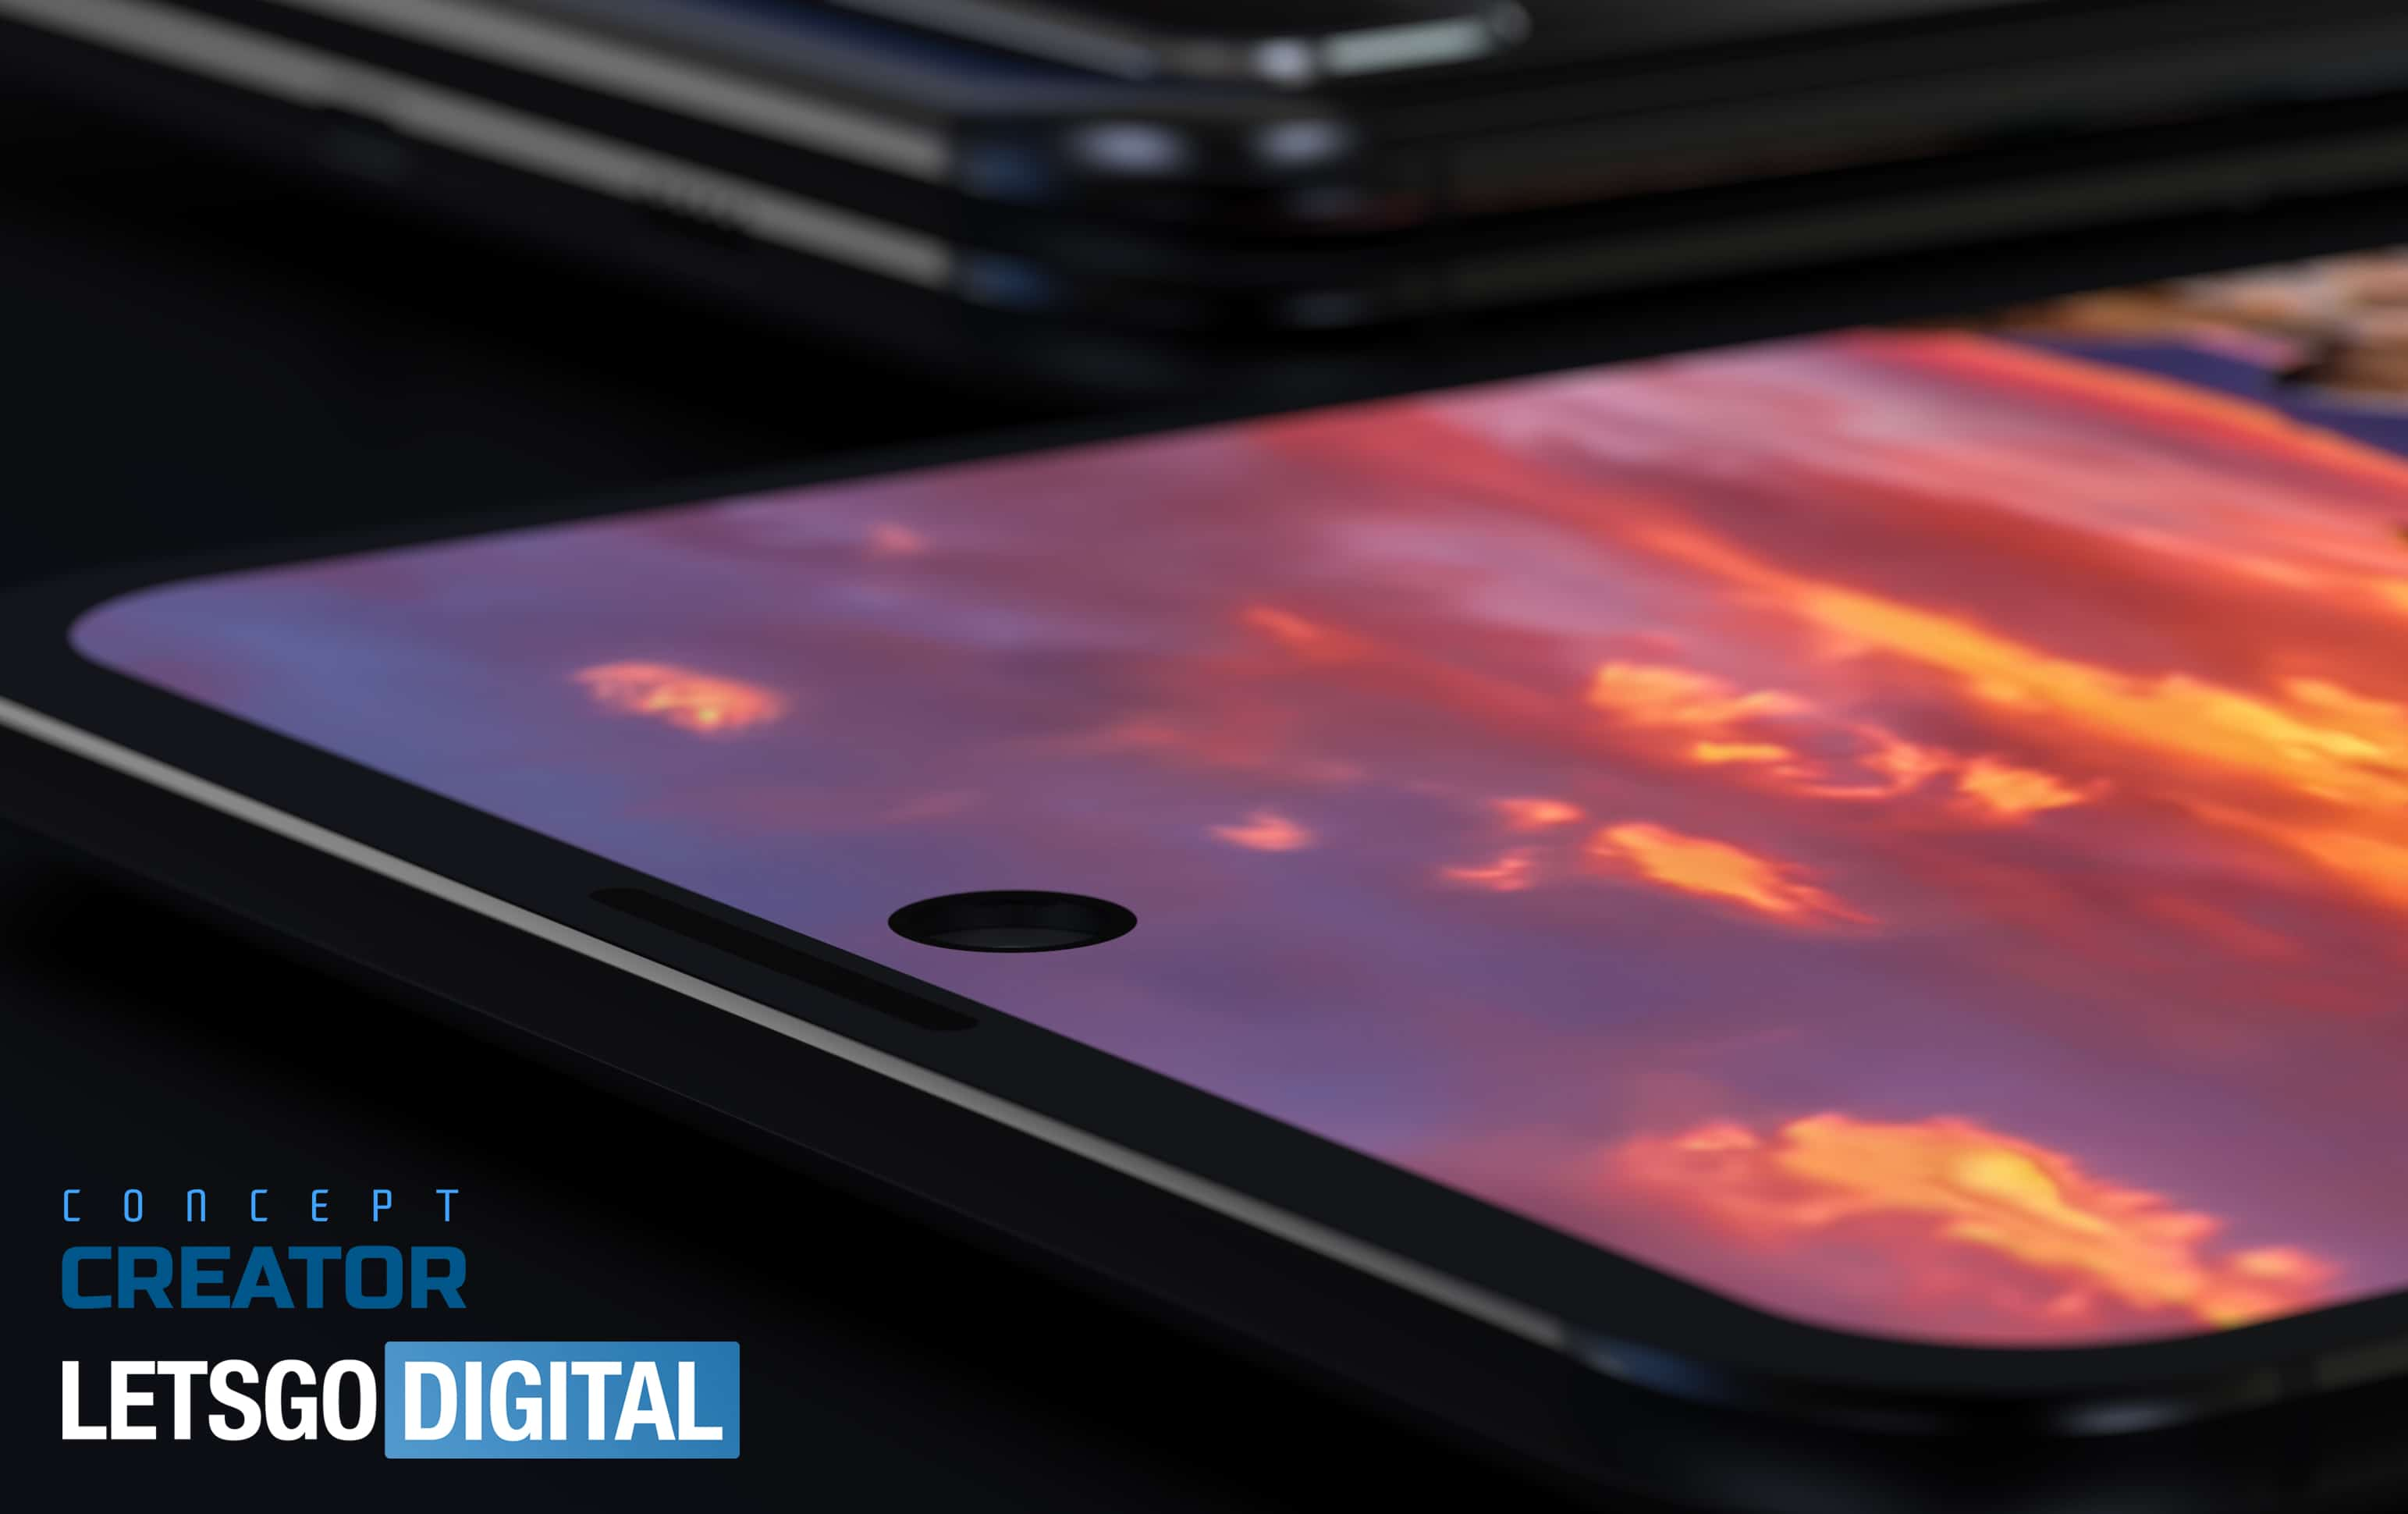 Samsung Galaxy Fold 2 concept image 4